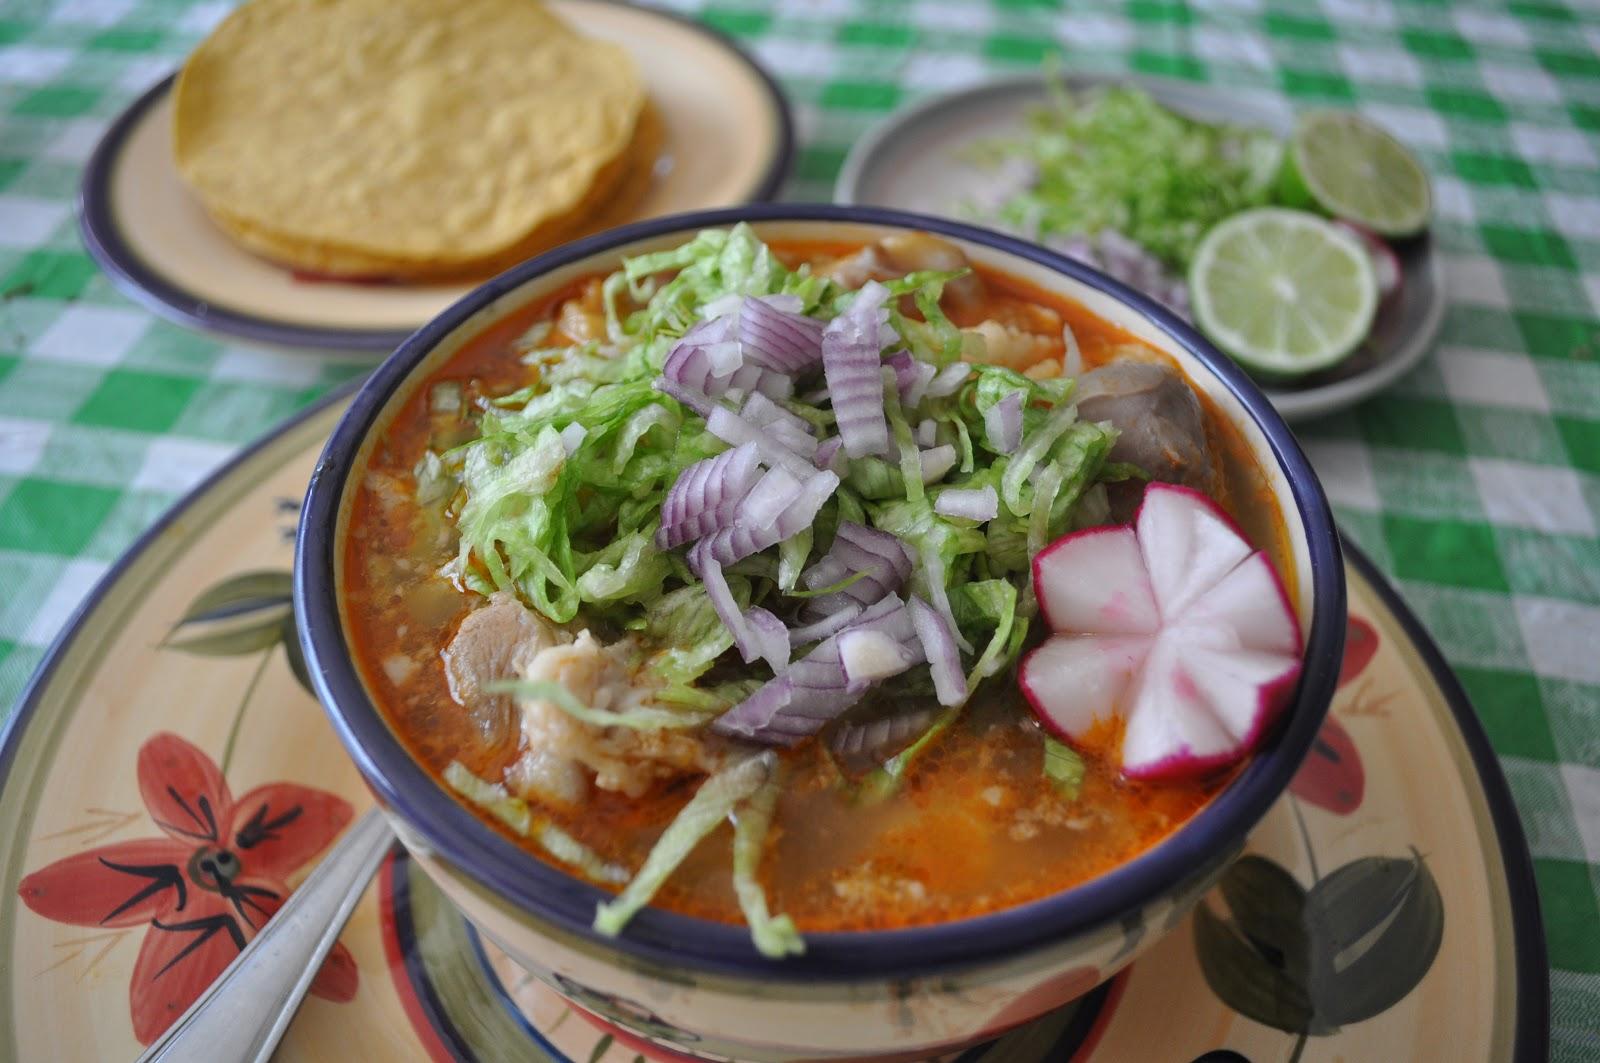 Jalisco Pozole (Red pozole) | Mex Spice